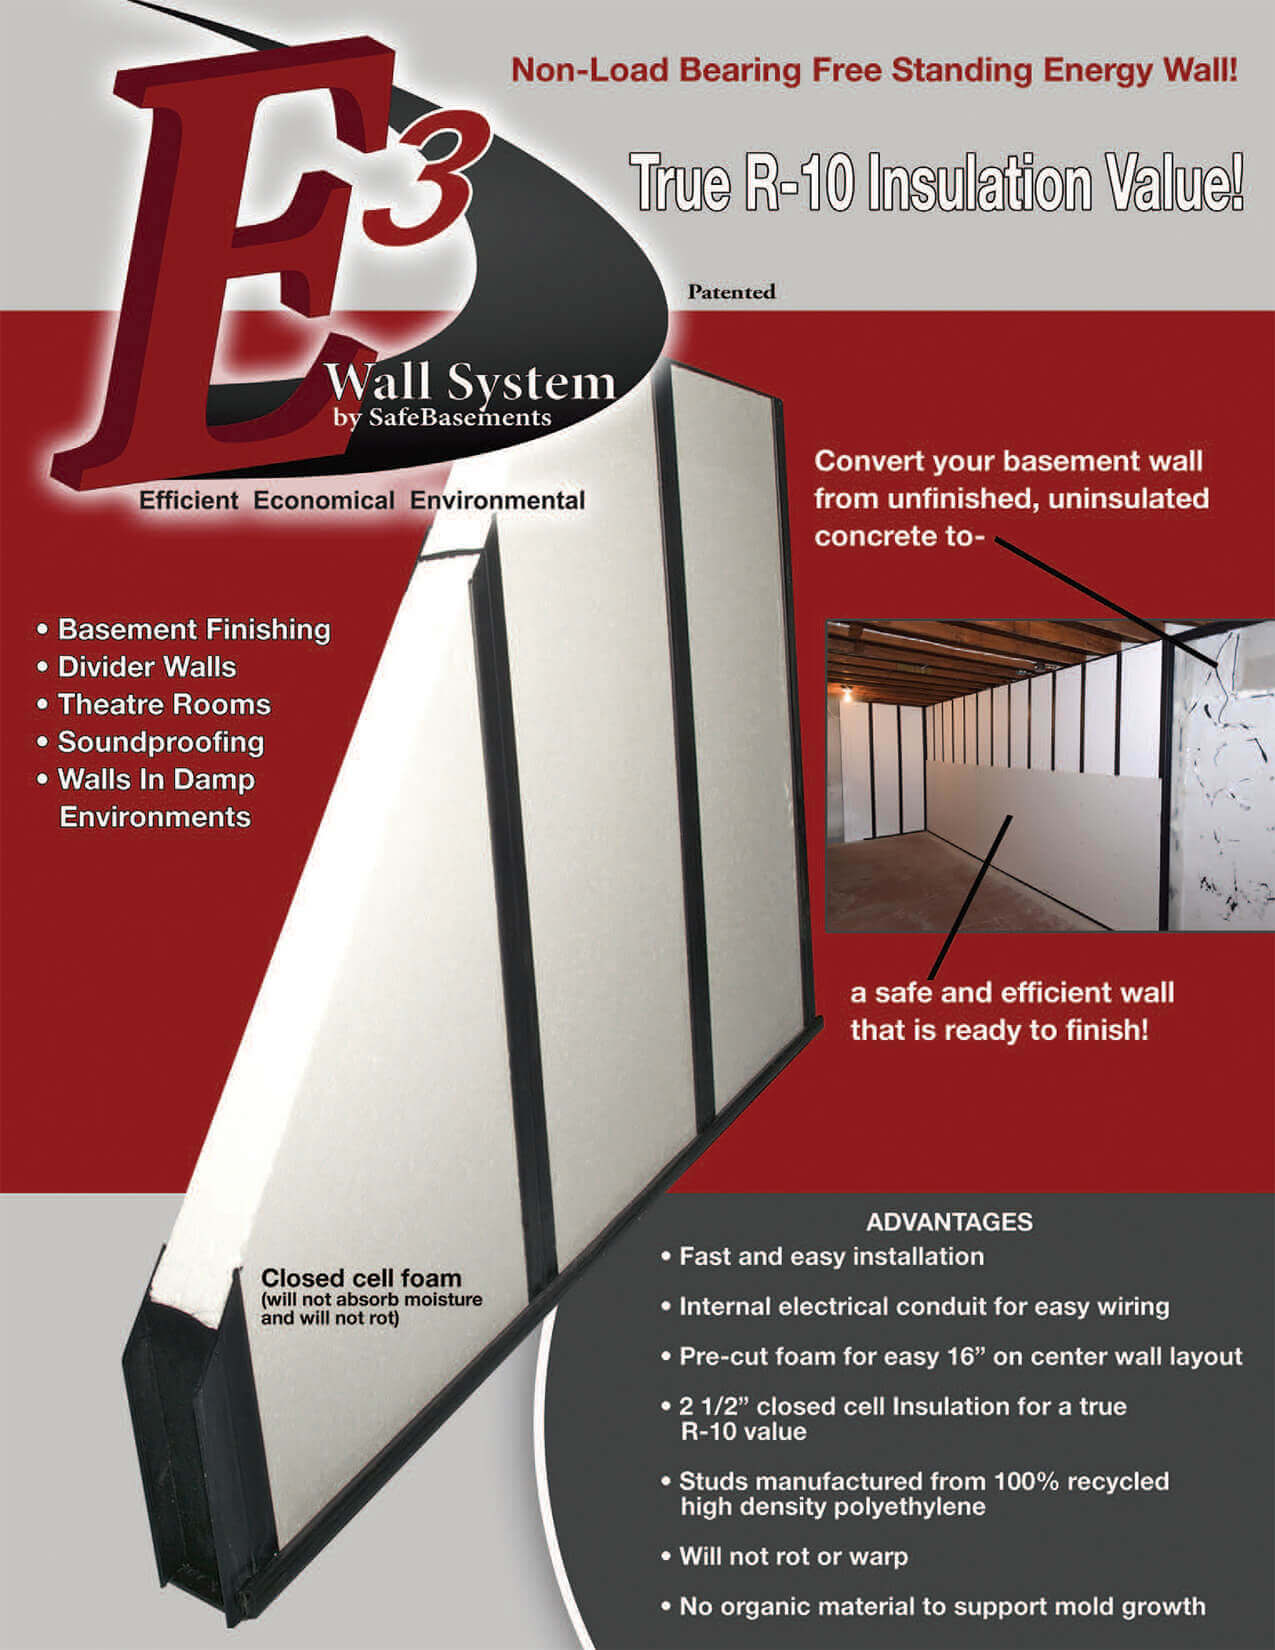 E3 Wall System Basement Finishing Safebasements Pre Wiring